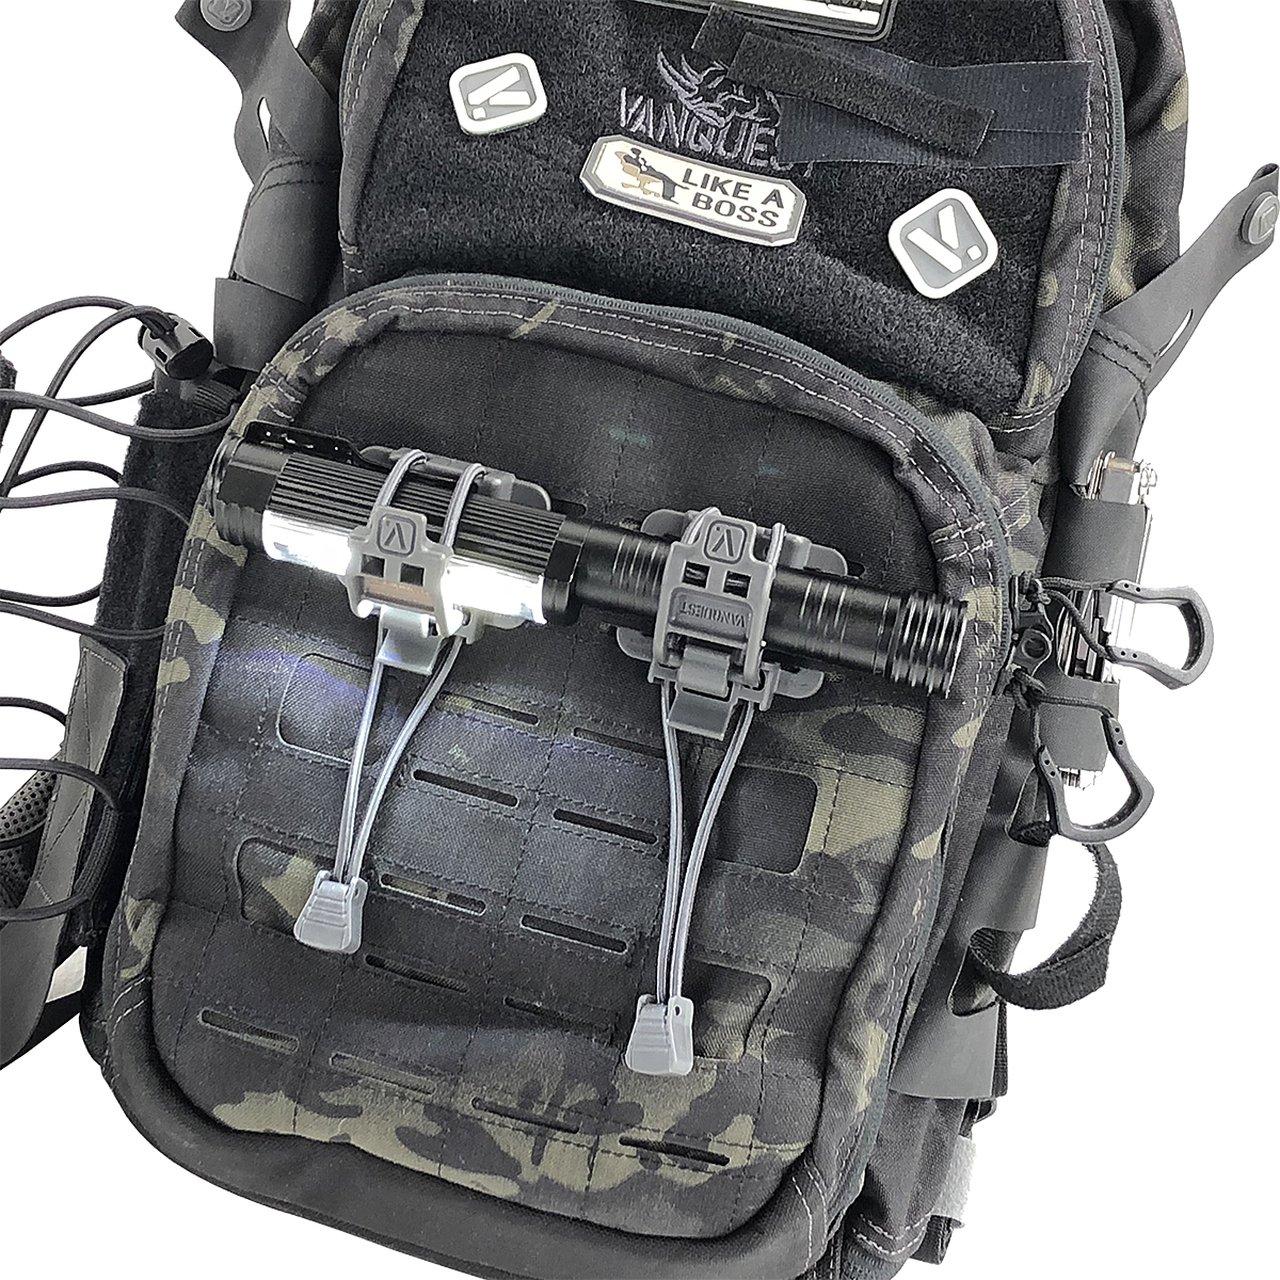 ELASTO Gear Locks (2-Pack) – Coyote Tan